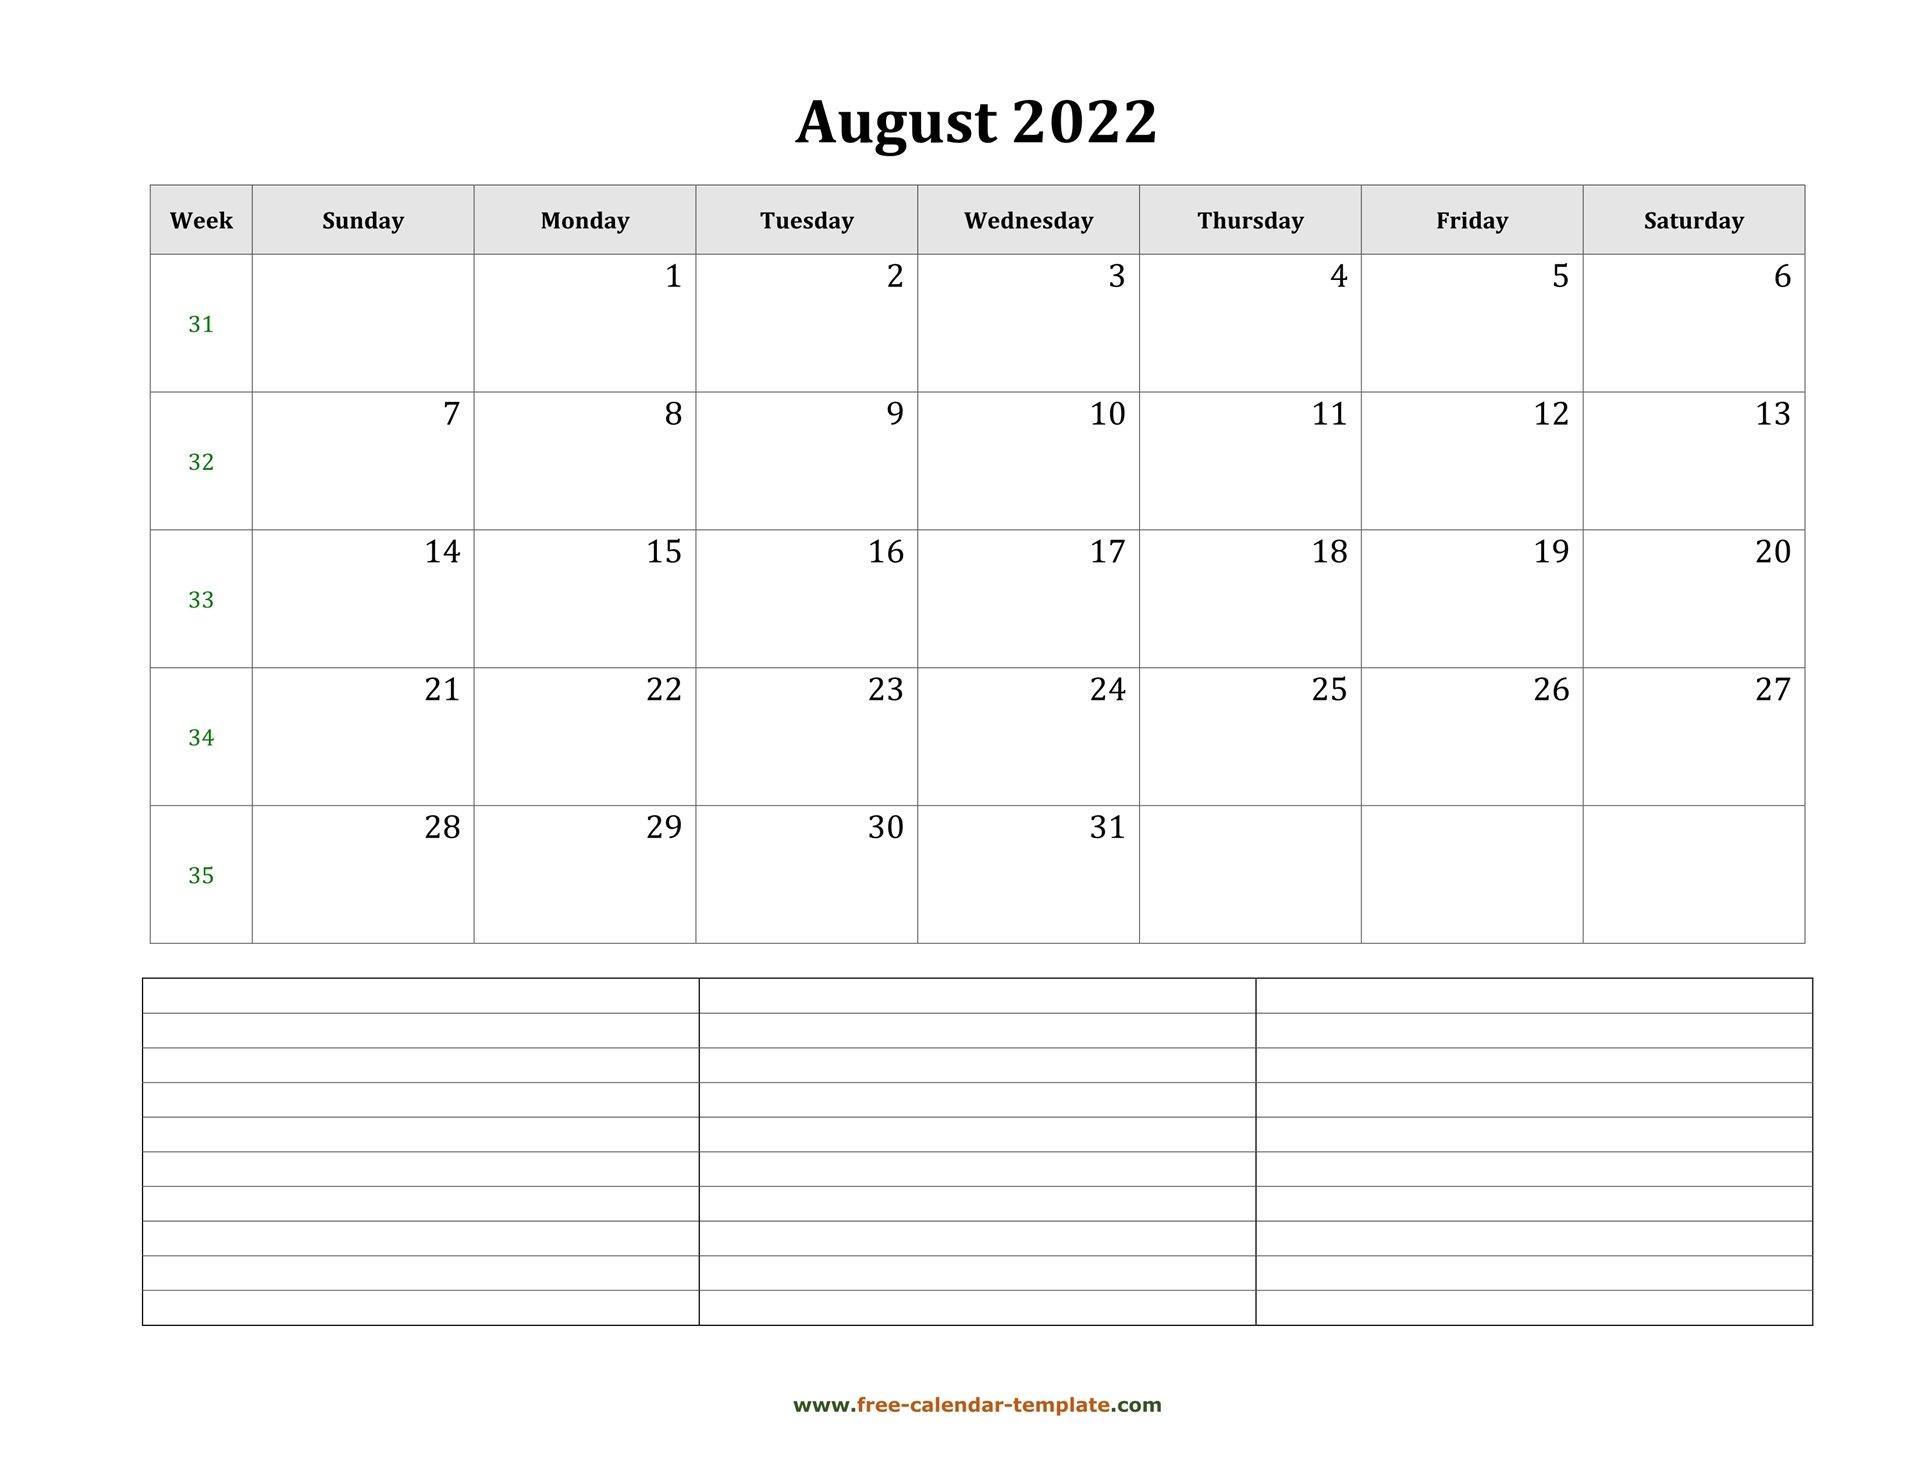 August 2022 Free Calendar Tempplate   Free-Calendar inside Free Printable Calendar August 2022 Graphics